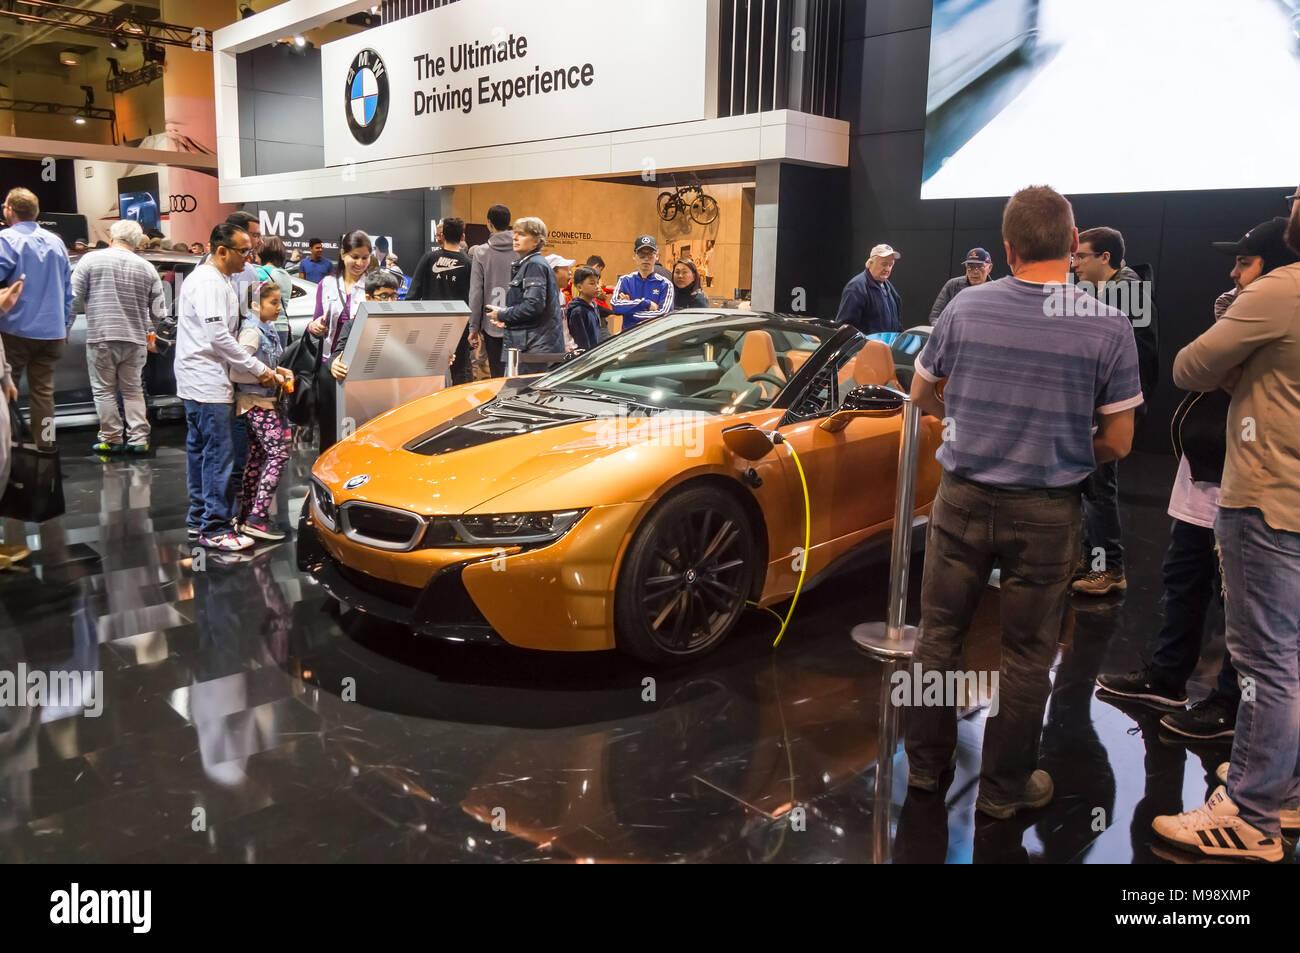 Toronto, Canada - 2018-02-19: Visitors of 2018 Canadian International AutoShow around the BMW i8 plug-in-hybrid car on Bayerische Motoren Werke AG exposition - Stock Image